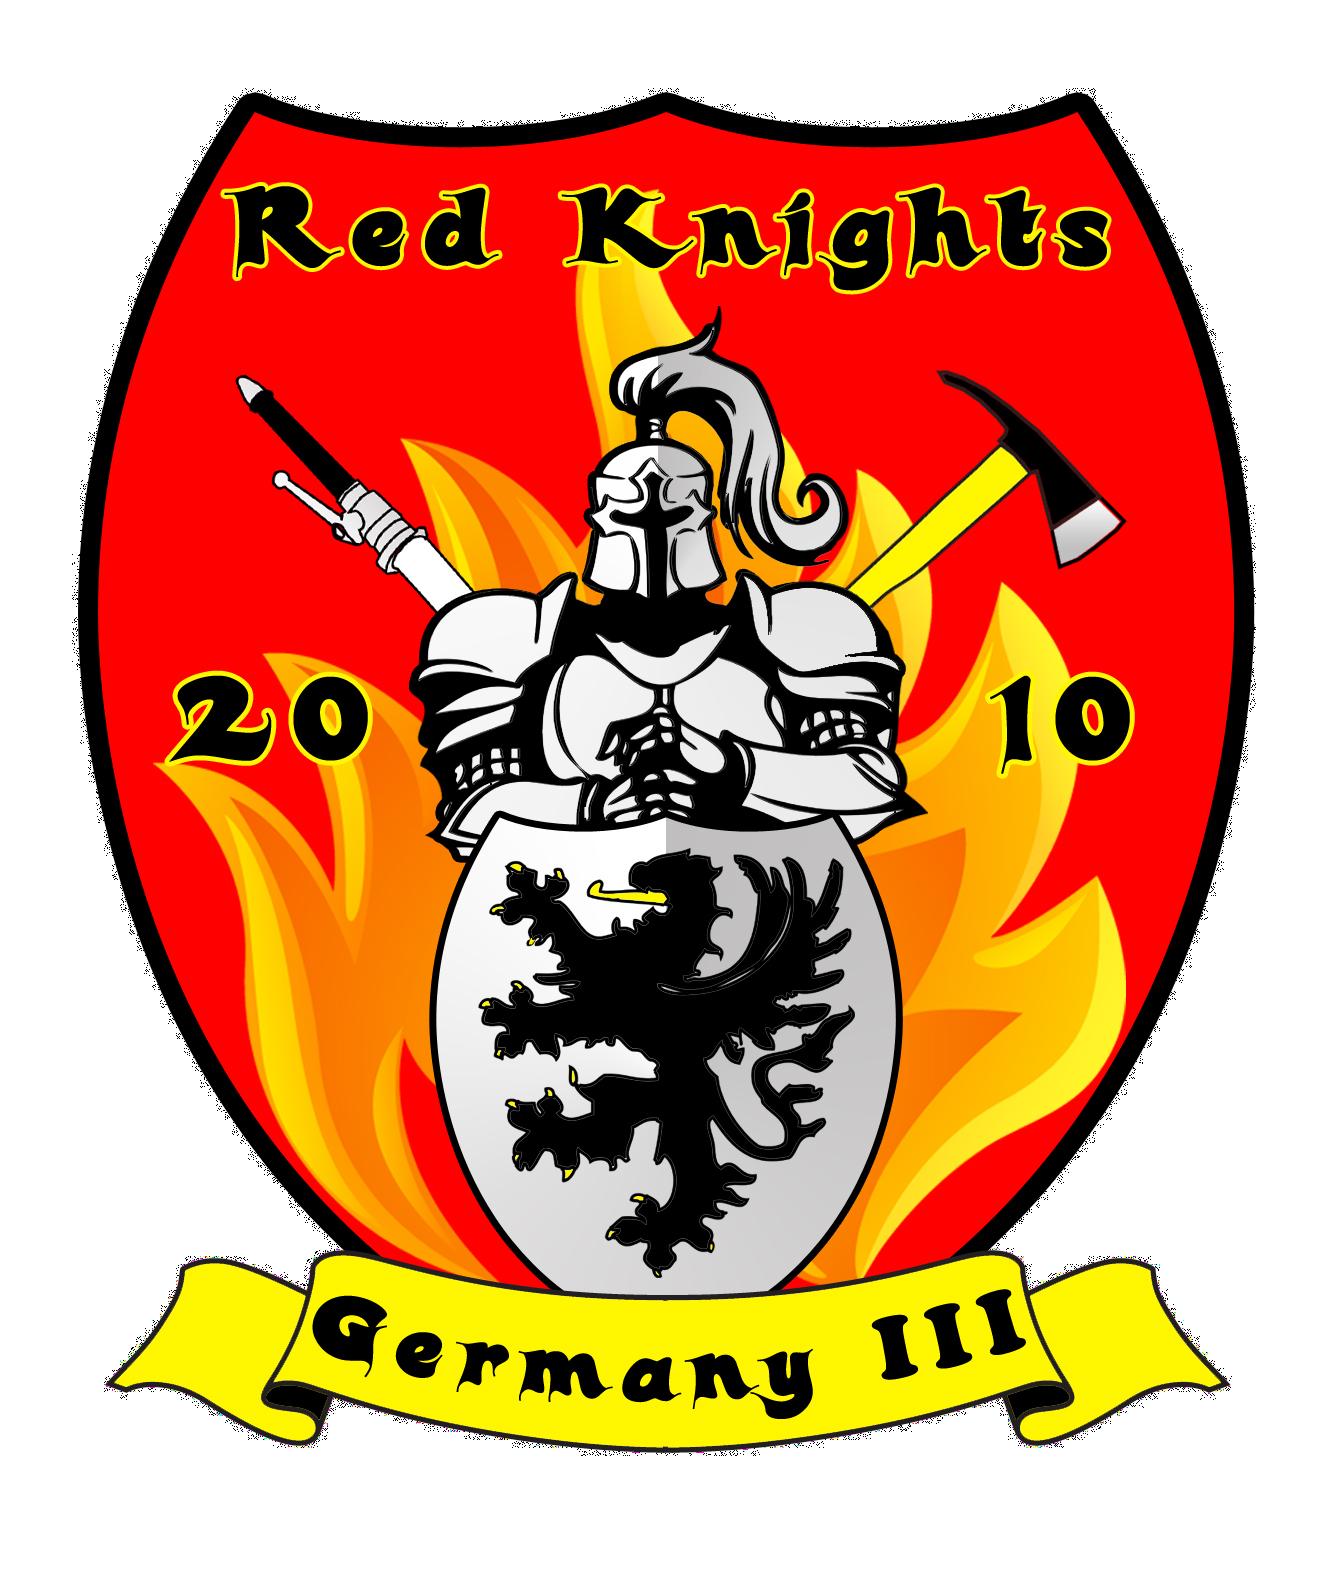 Red Knights MC Germany III